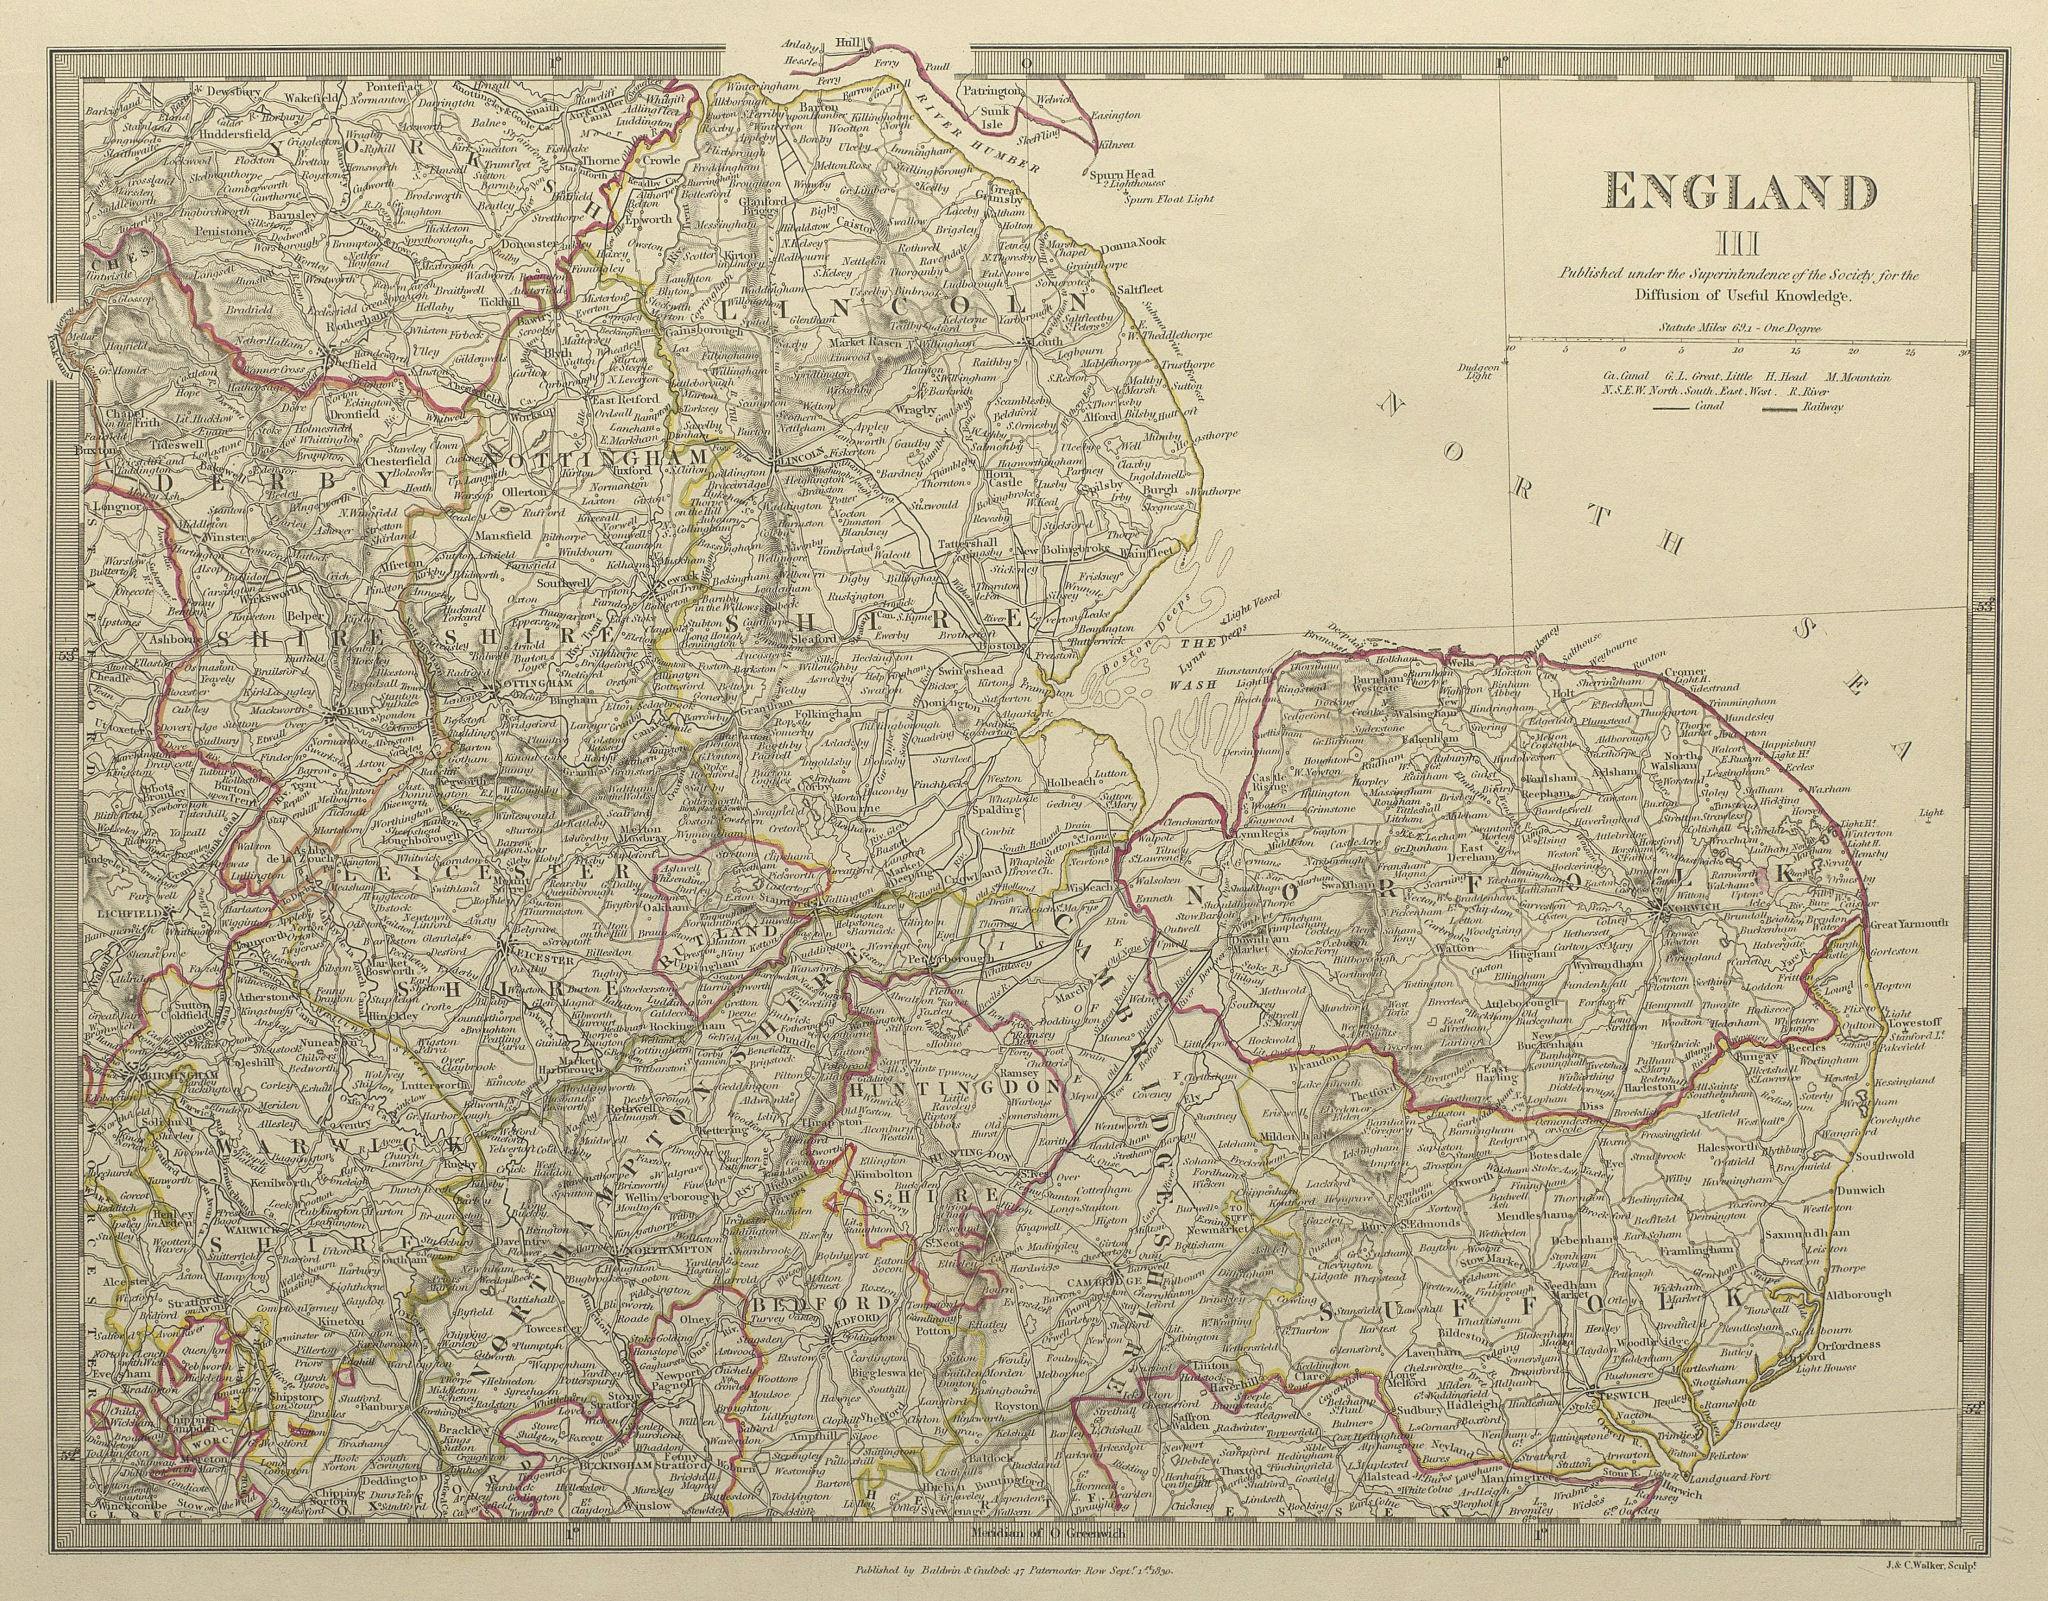 ENGLAND EAST Norfolk Suffolk Cambs Lincs Leics Derbys Notts. SDUK 1844 old map